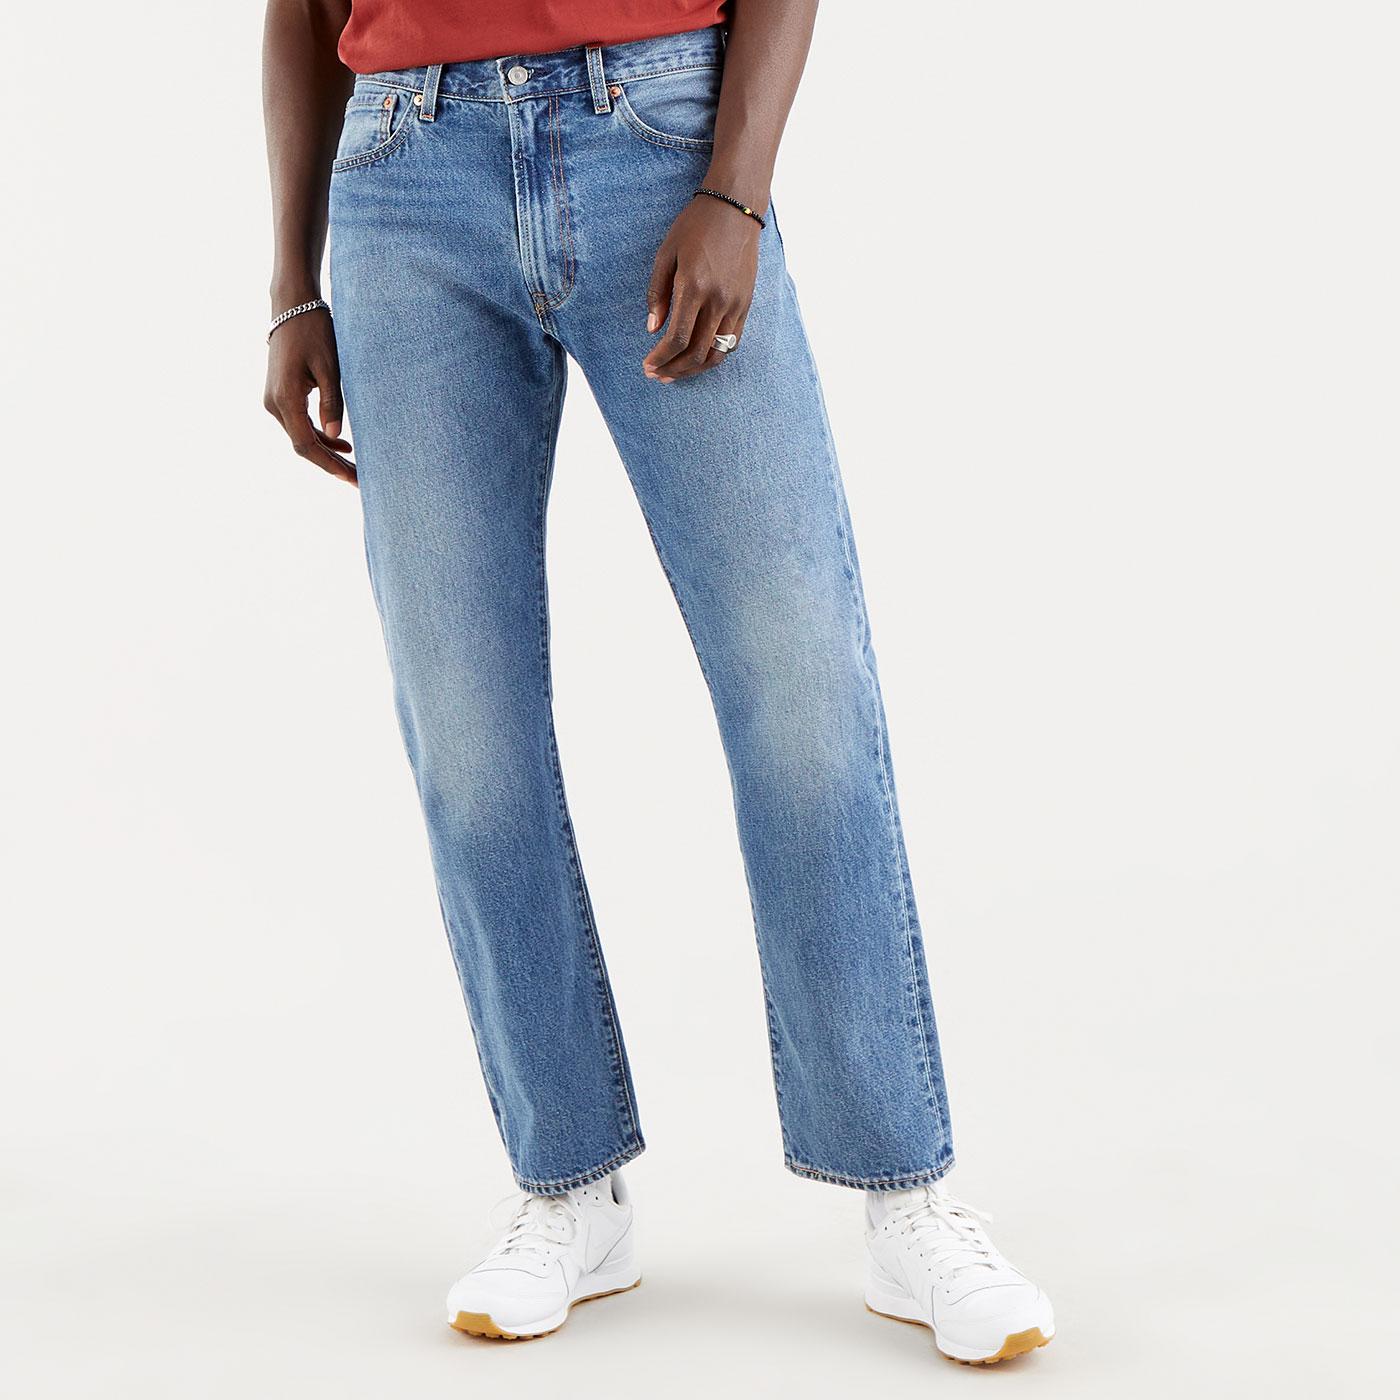 LEVI'S 551Z Authentic Straight Denim Jeans (BB)